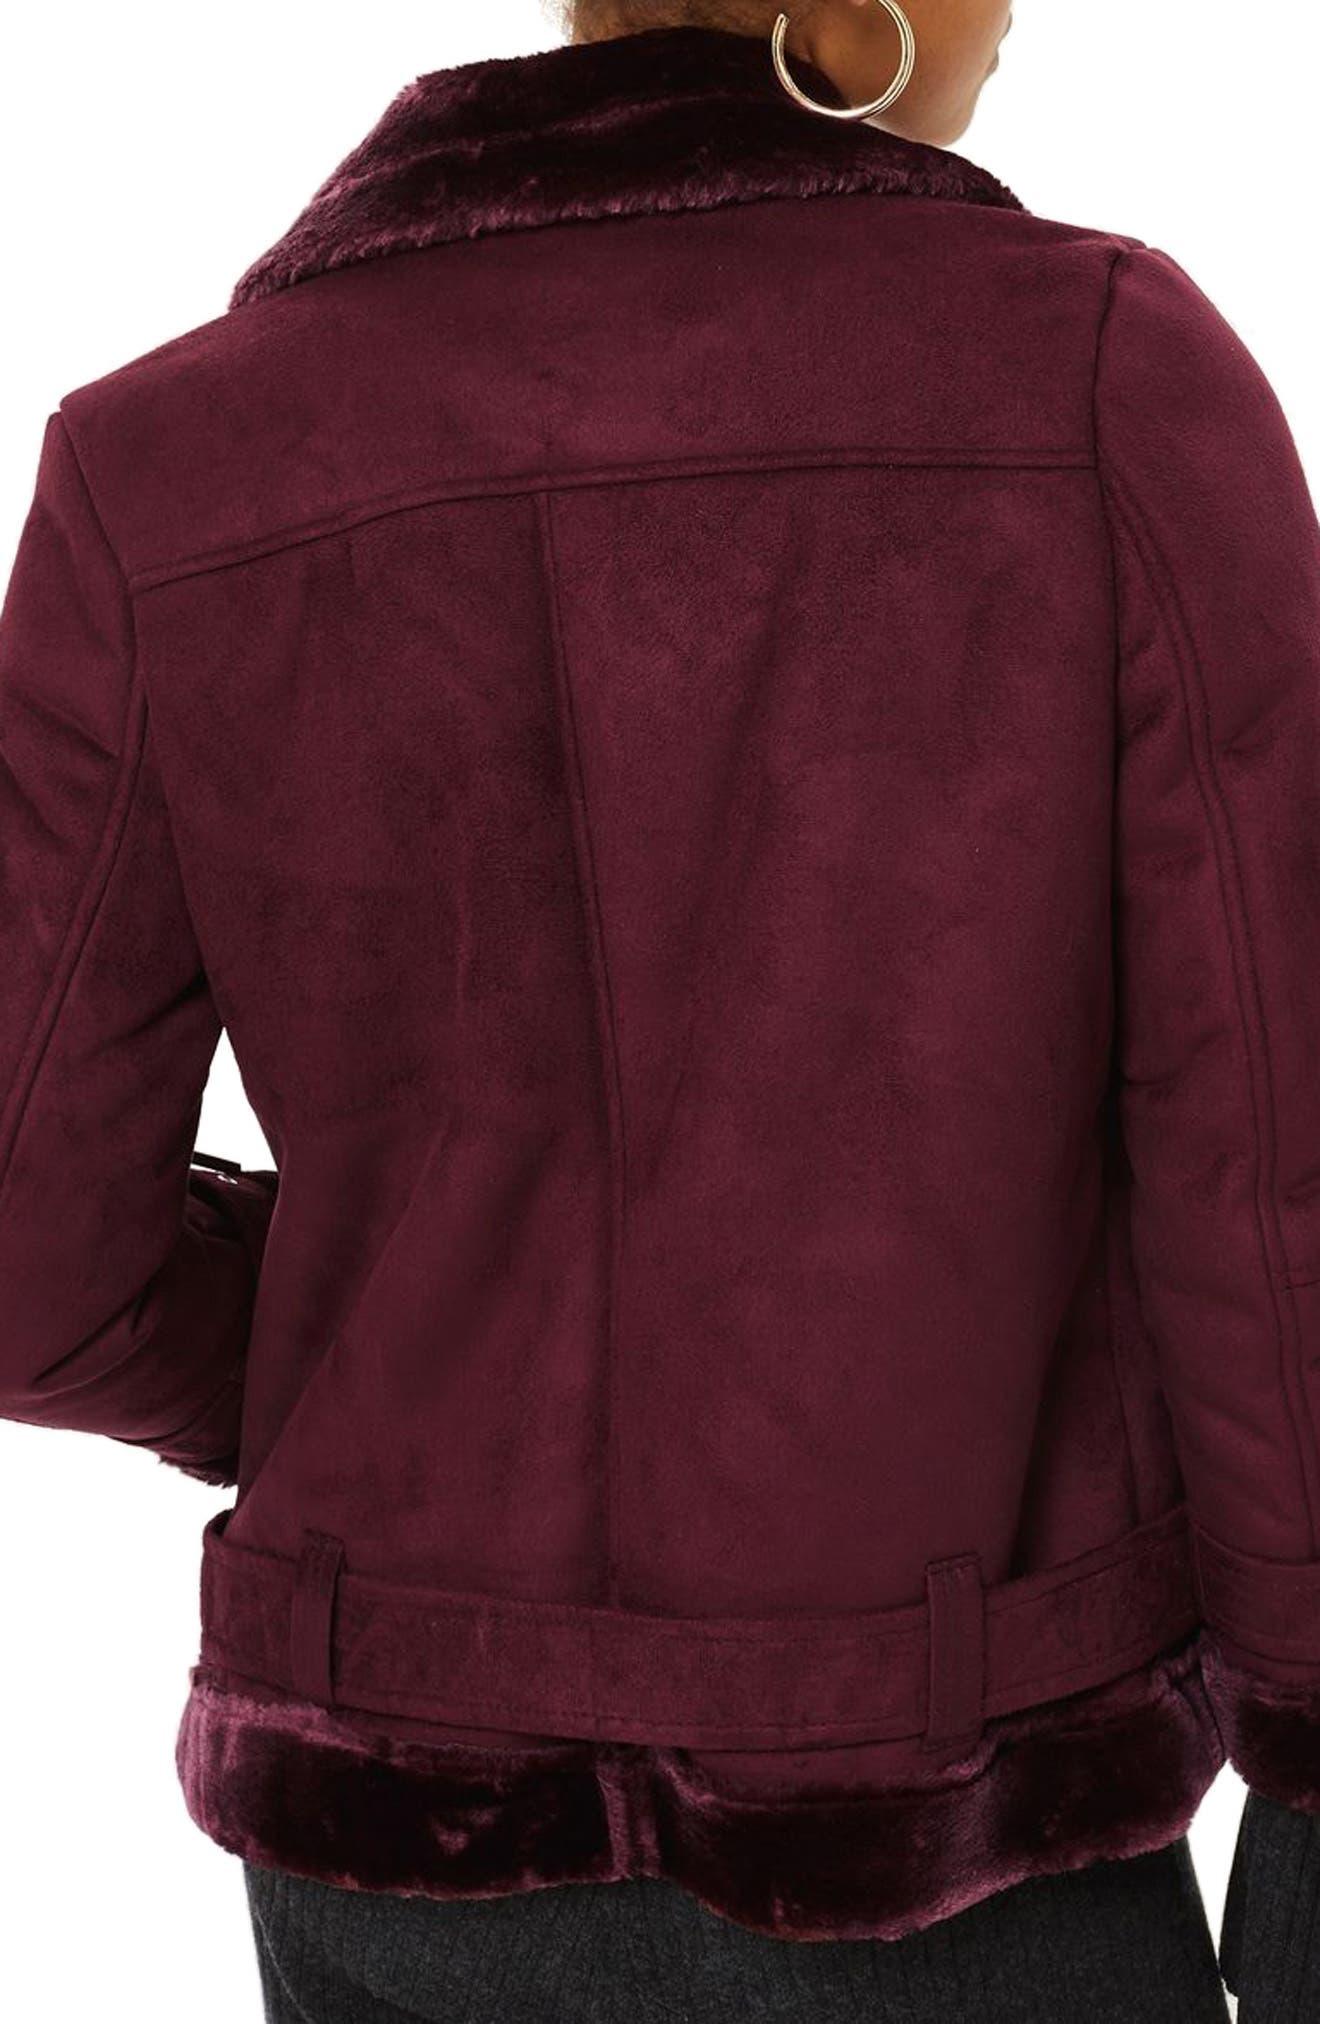 Cooper Faux Shearling Biker Jacket,                             Alternate thumbnail 2, color,                             931